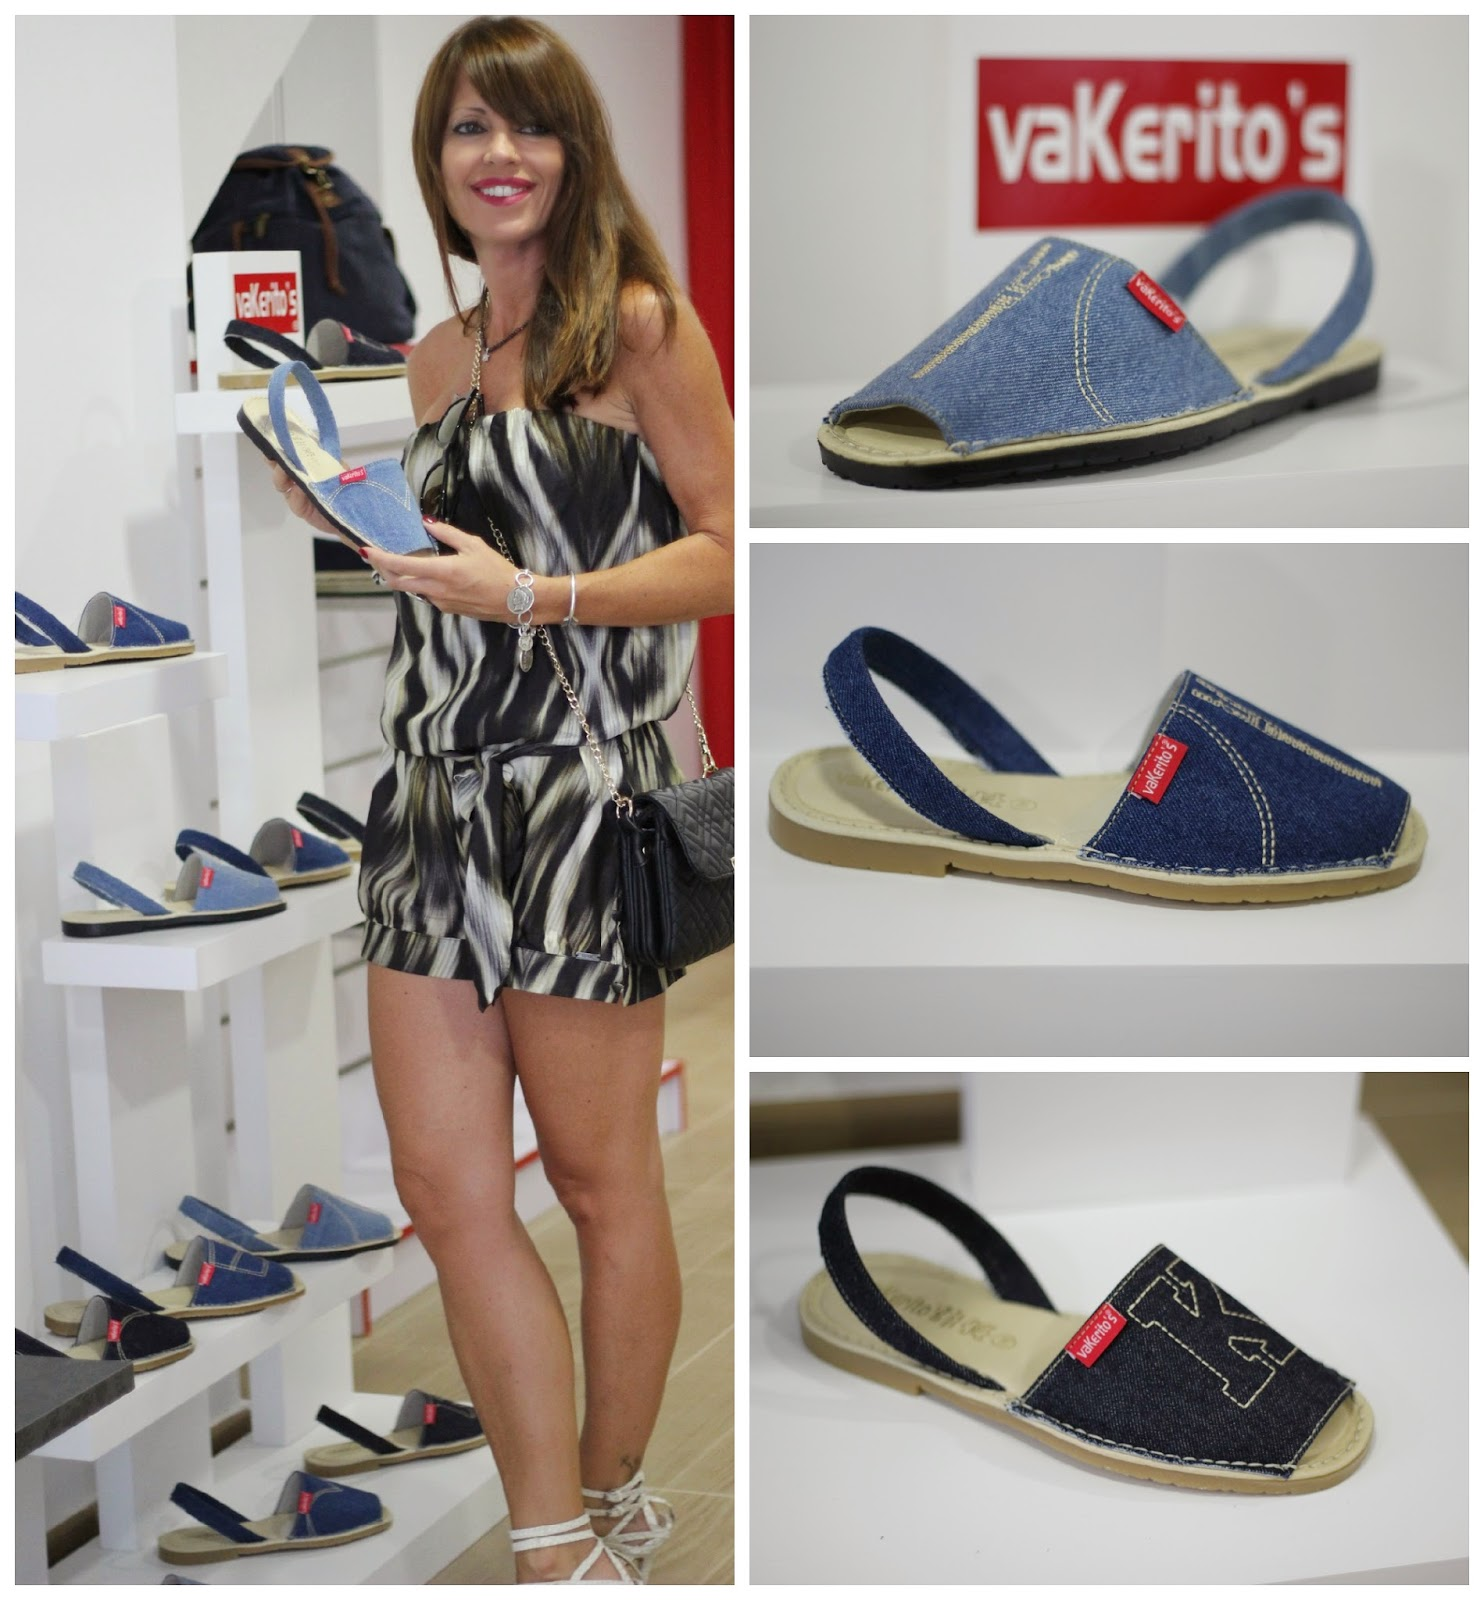 vakeritos - menorquinas vaqueras - calzado spain